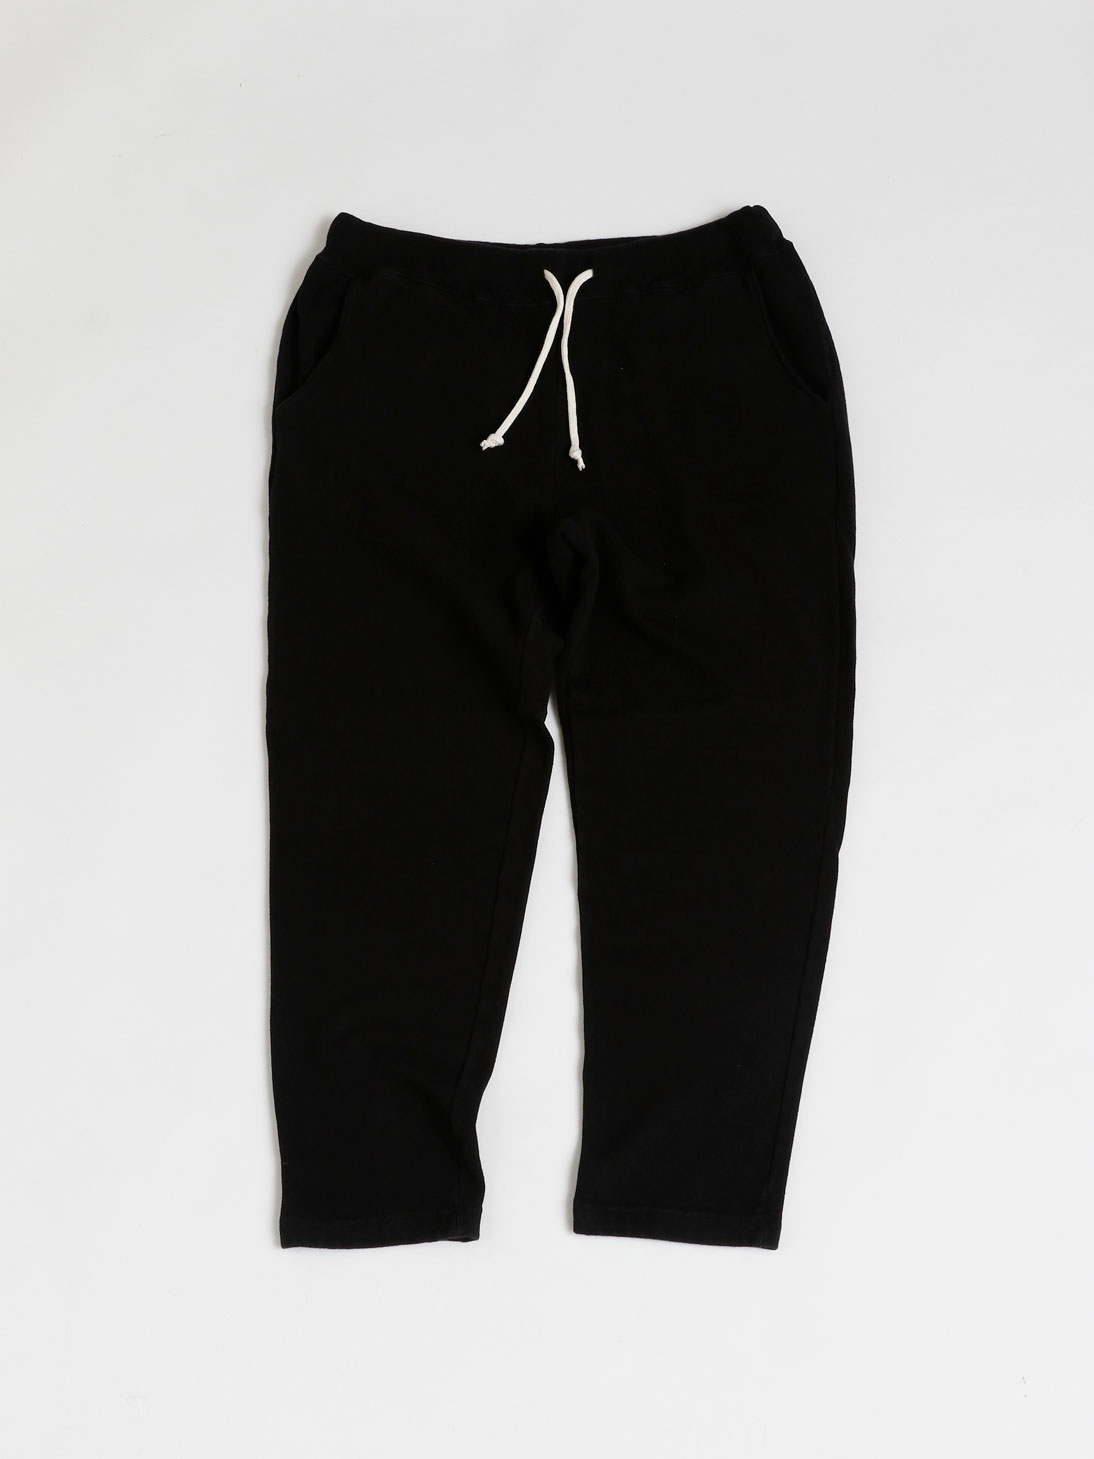 NNR002 Cropped Pants